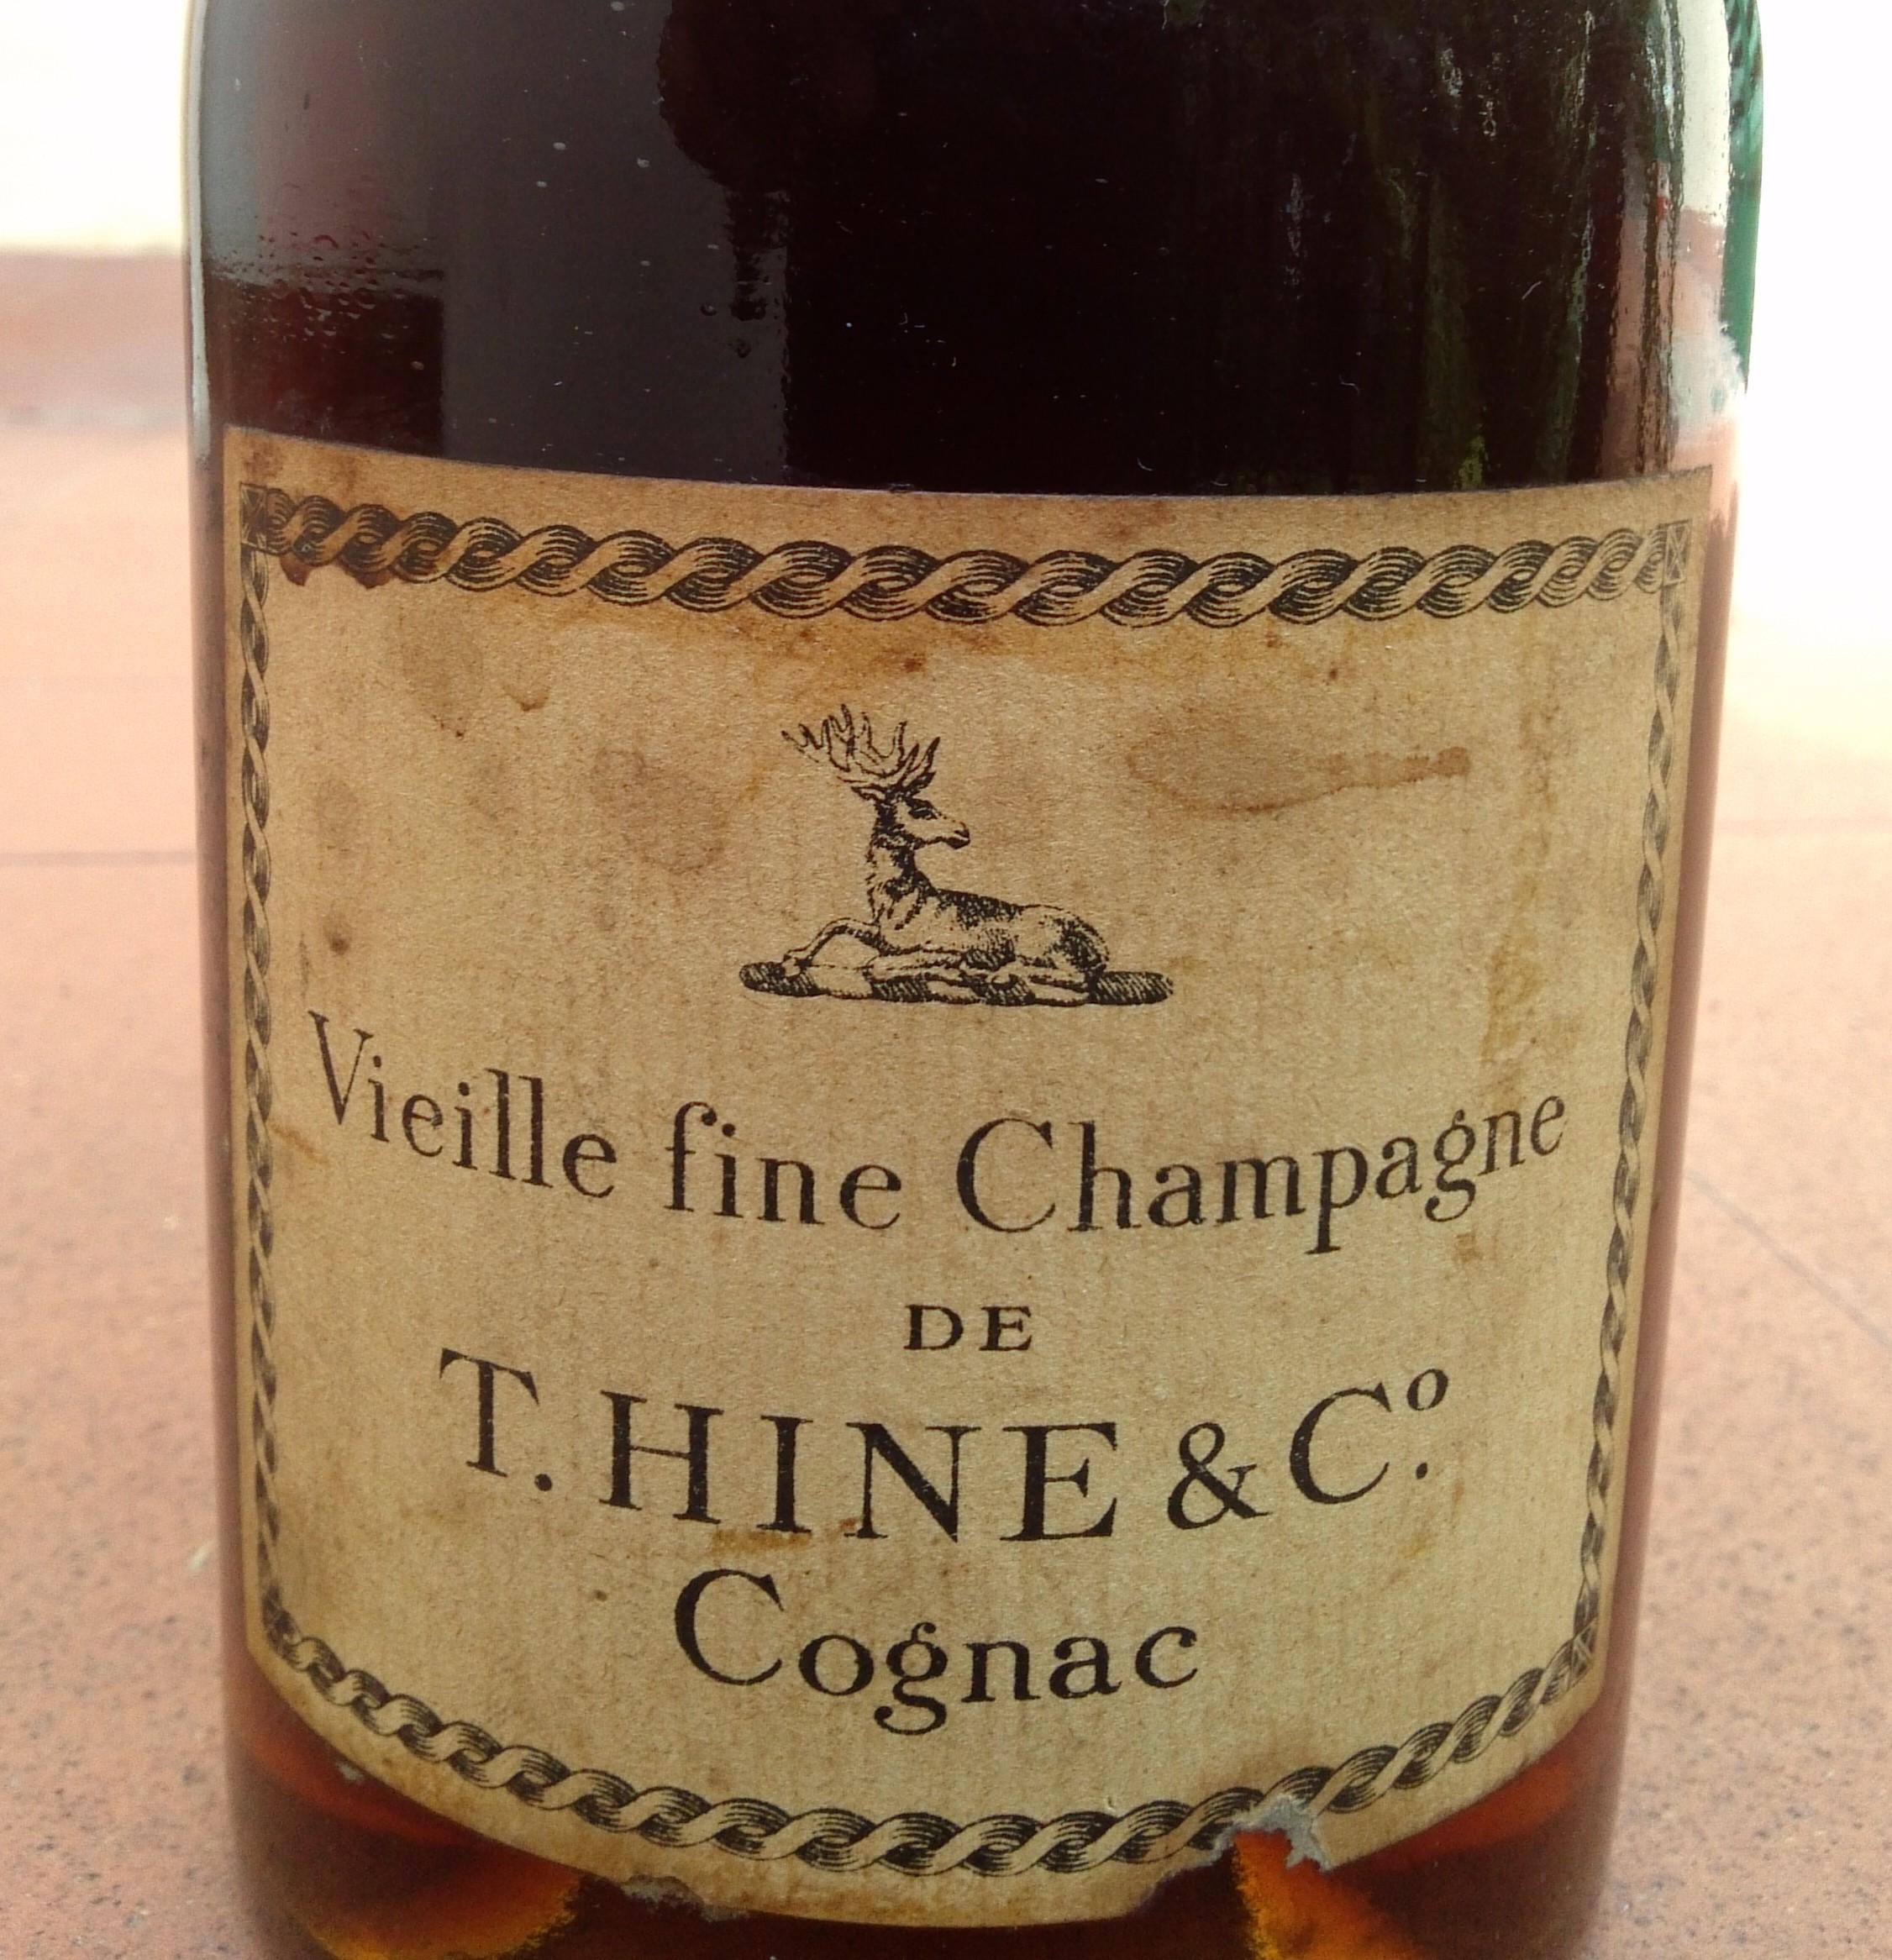 Hine Vieille Fine Champagne Cognac